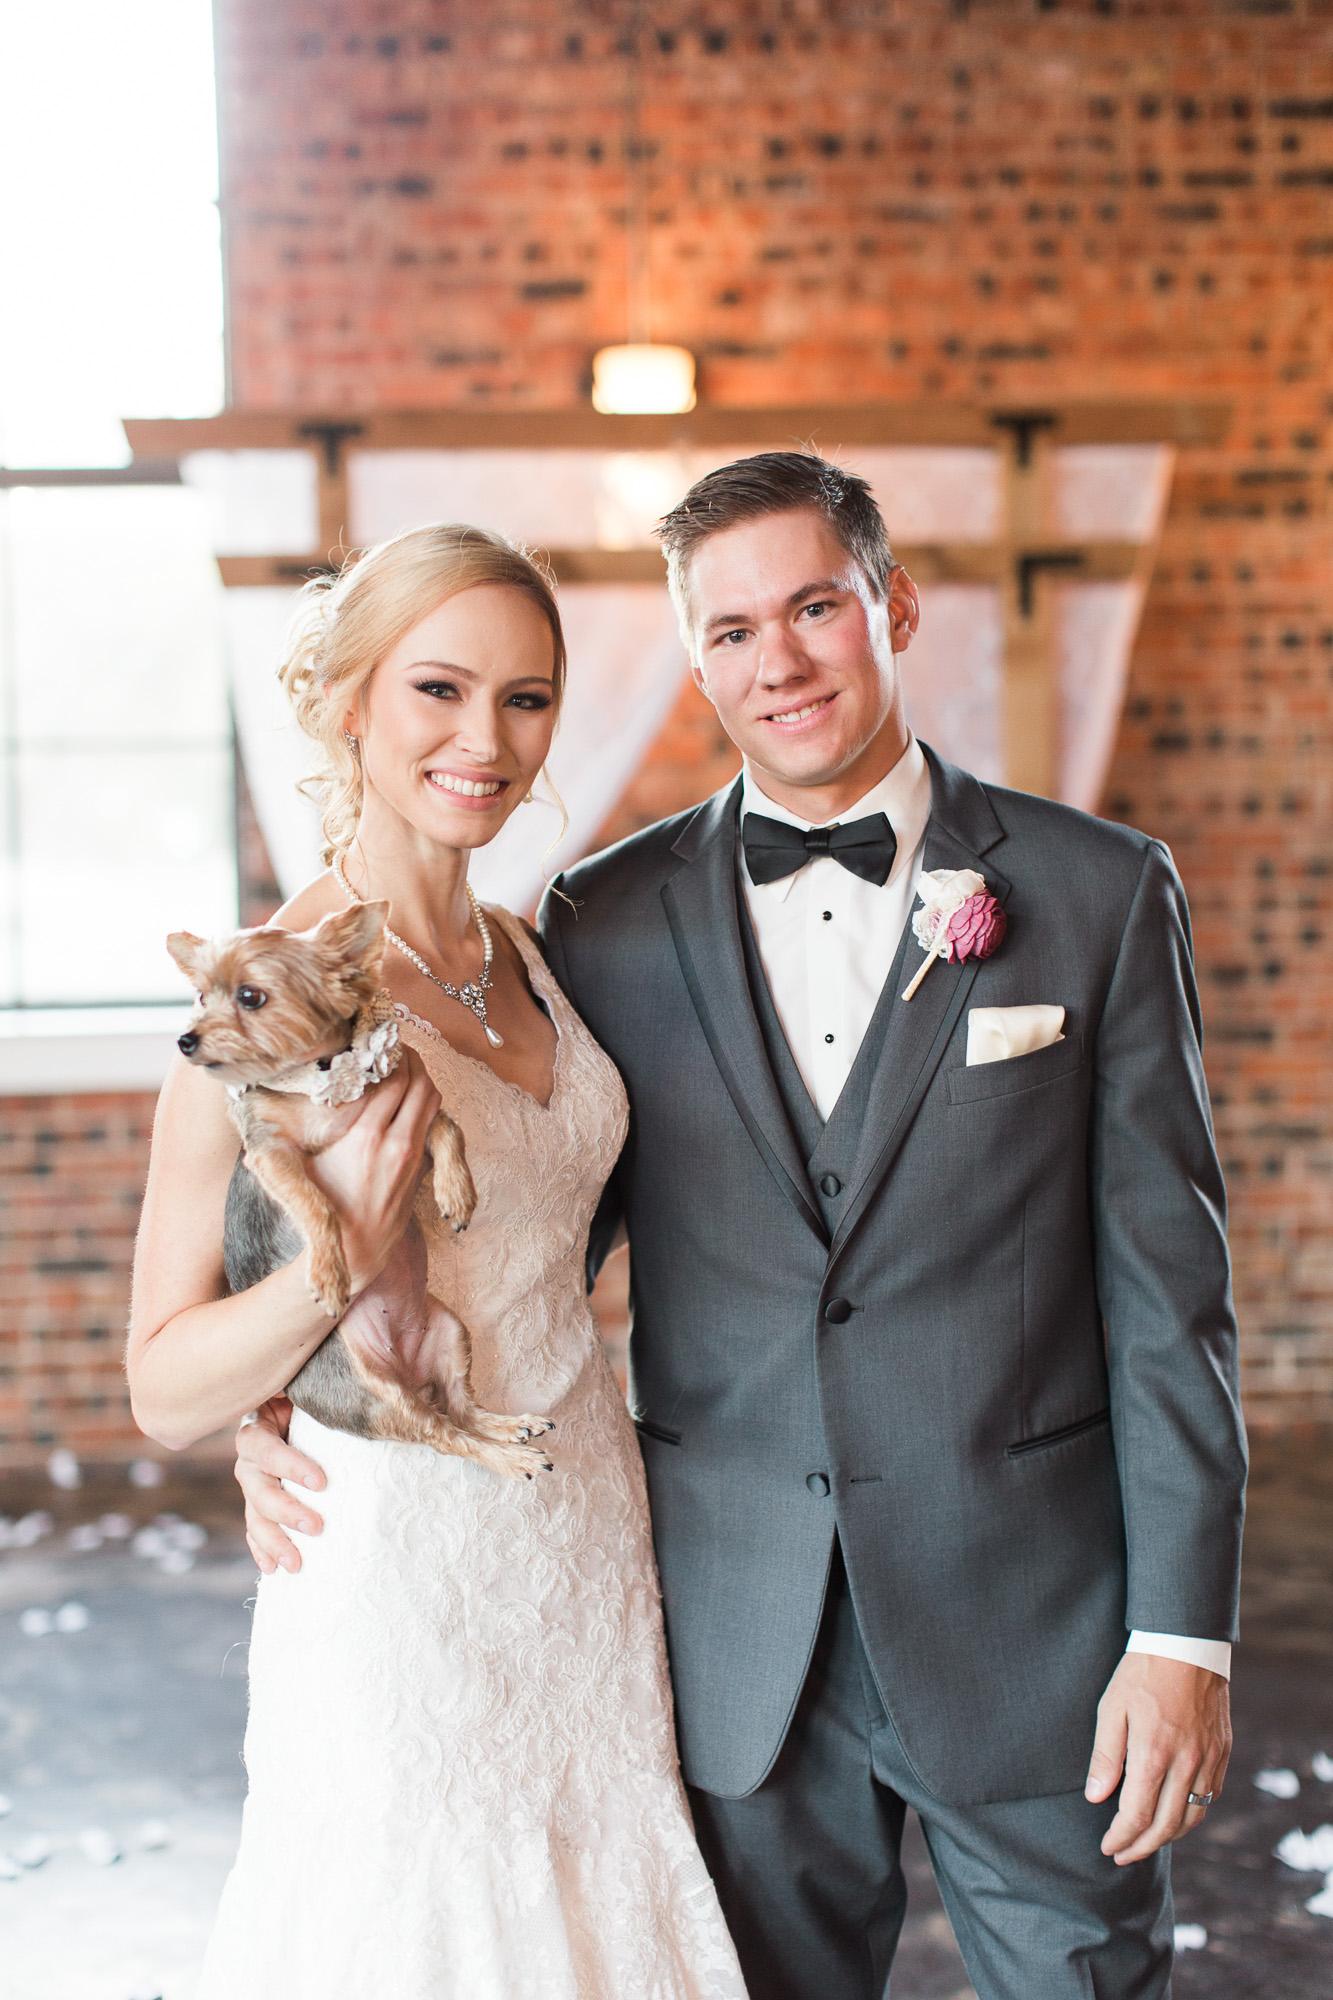 8779b-downtown-bryan-weddingdowntown-bryan-wedding.jpg